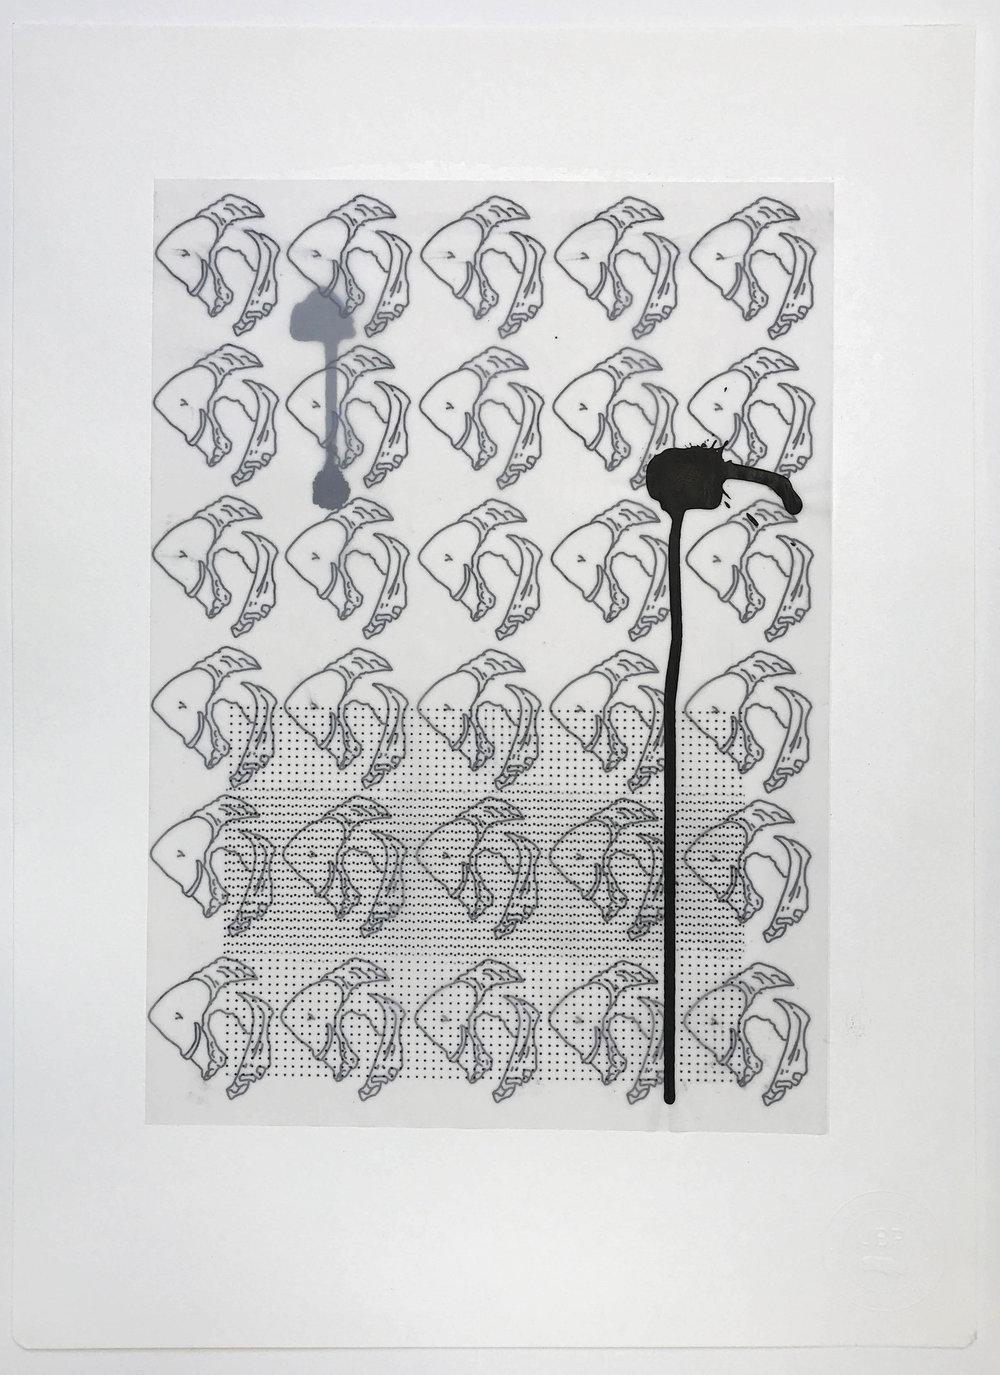 %22Observación de la frialdad%22- Técnica mixta  - 42 x 30 cm - Julián Brangold - 2018.jpg